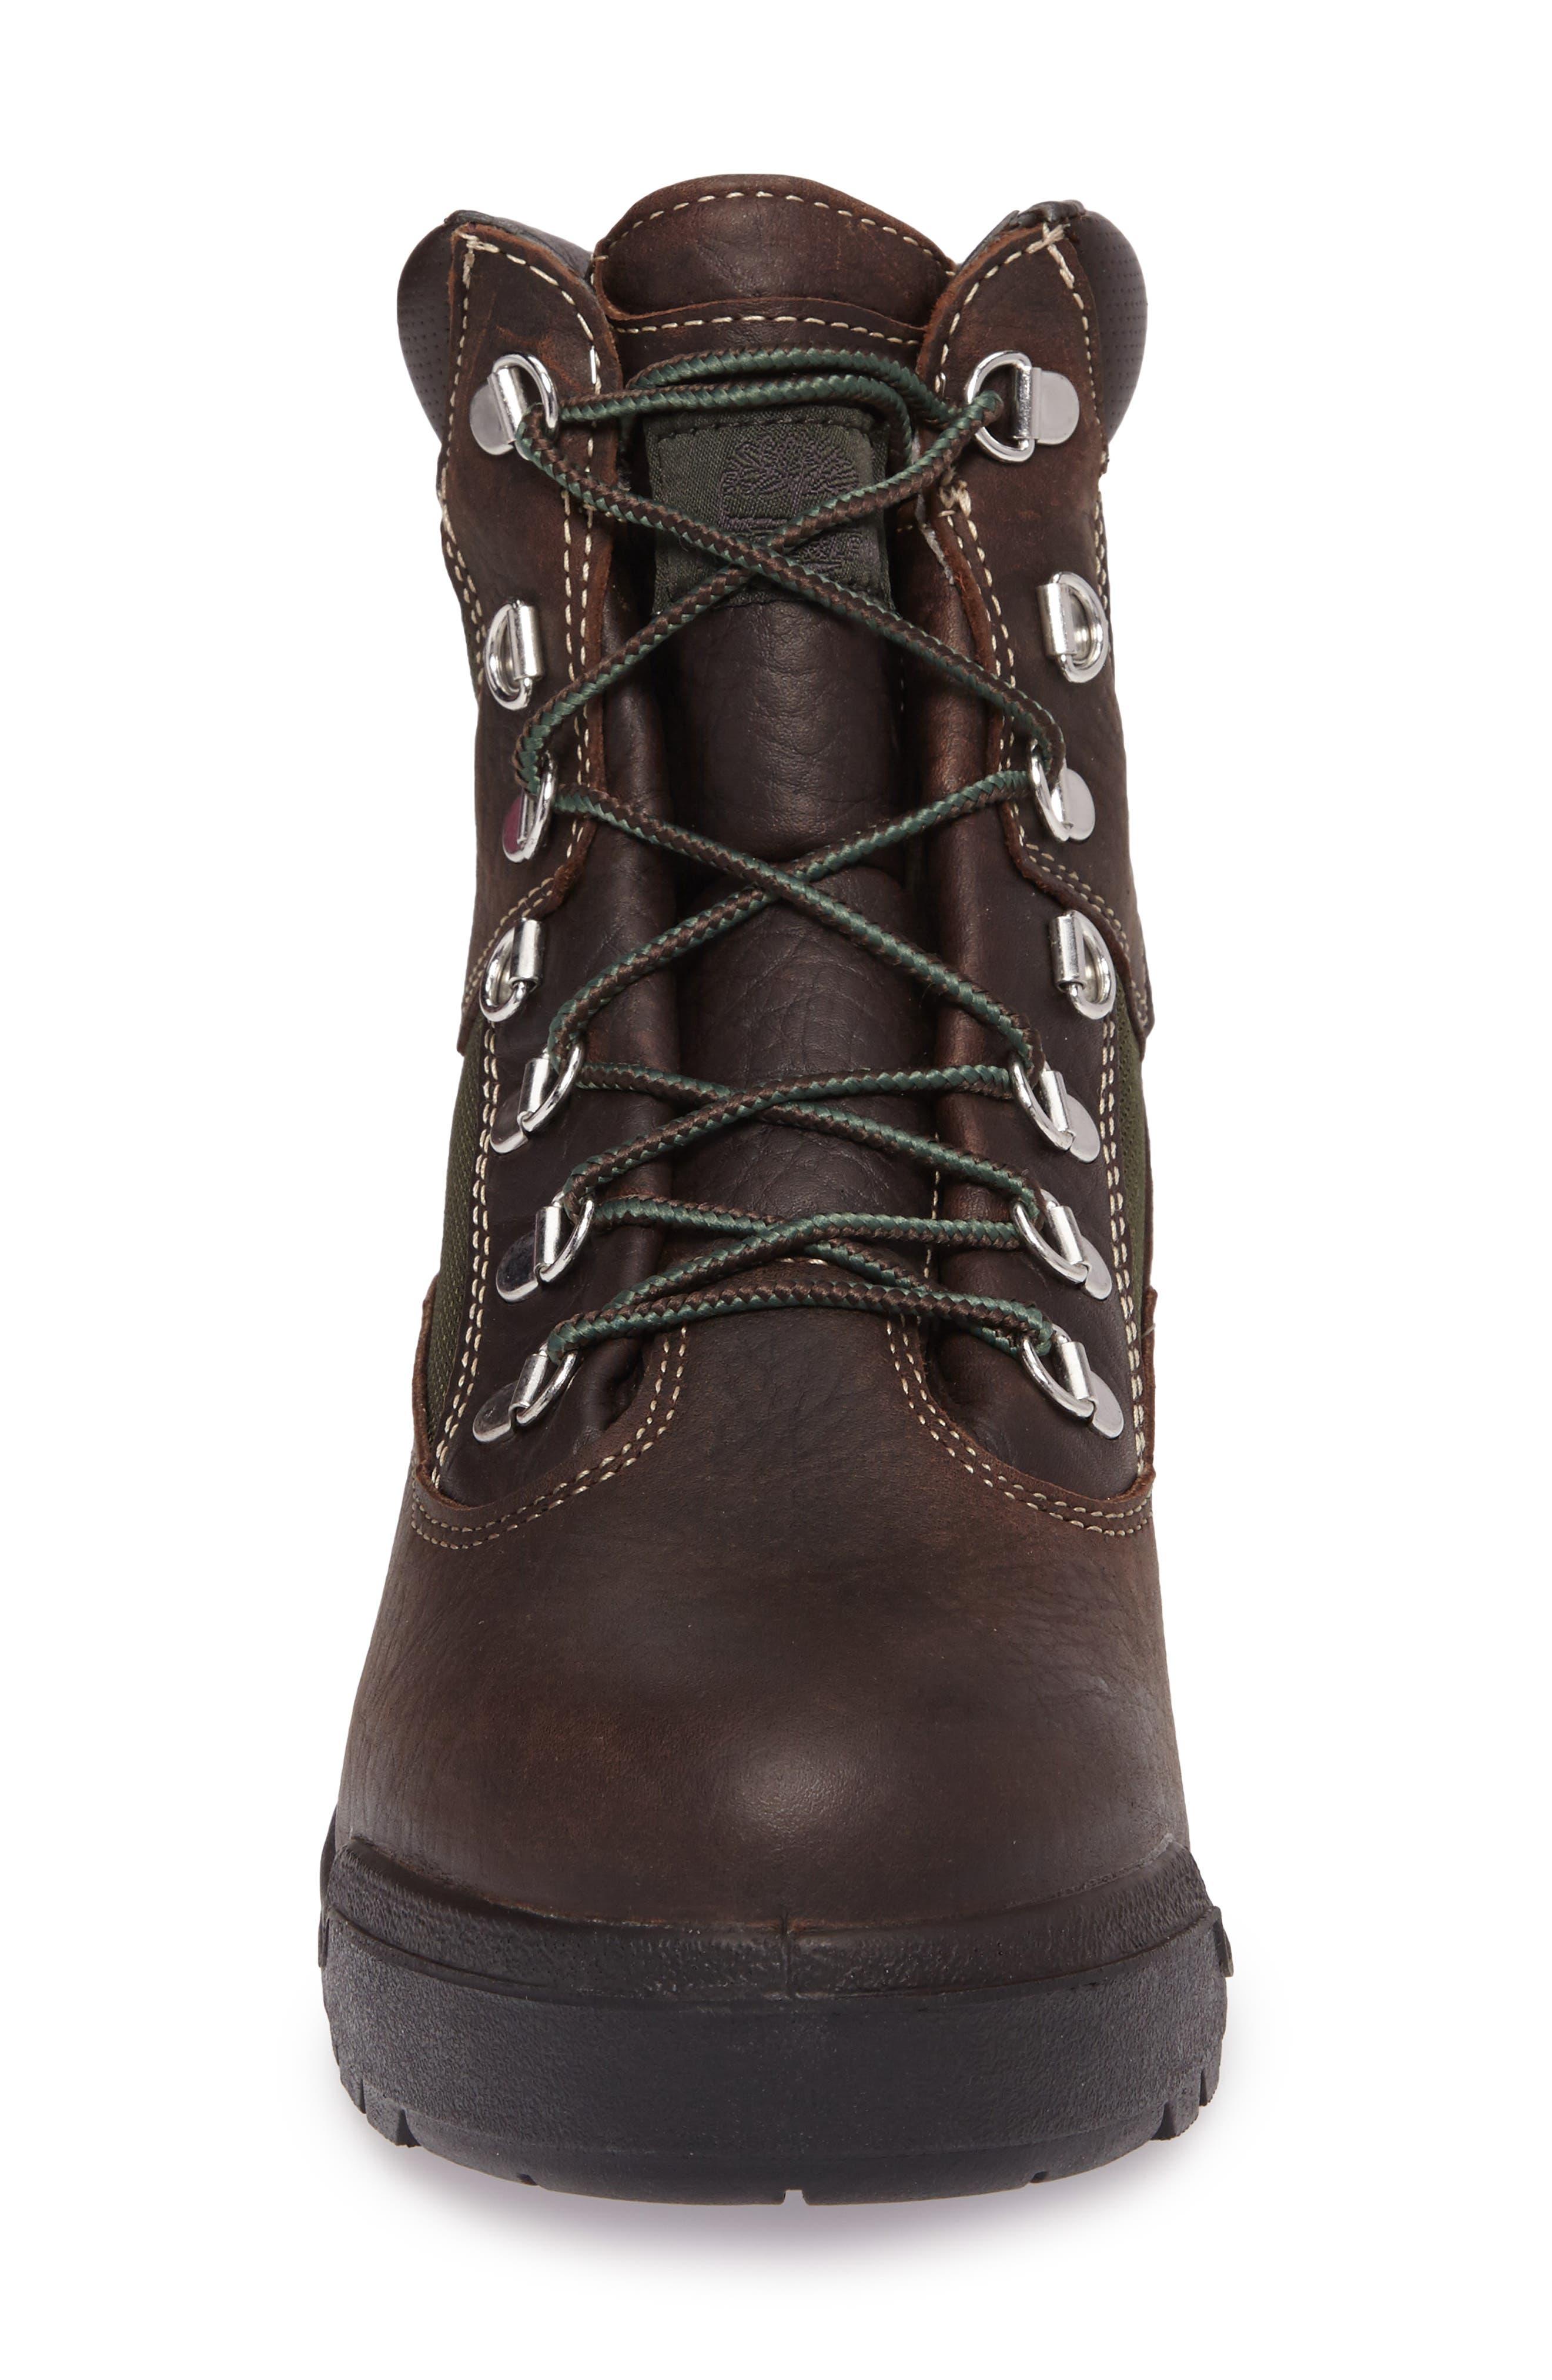 Field Waterproof Winter Boot,                             Alternate thumbnail 4, color,                             Hazel Highway Leather